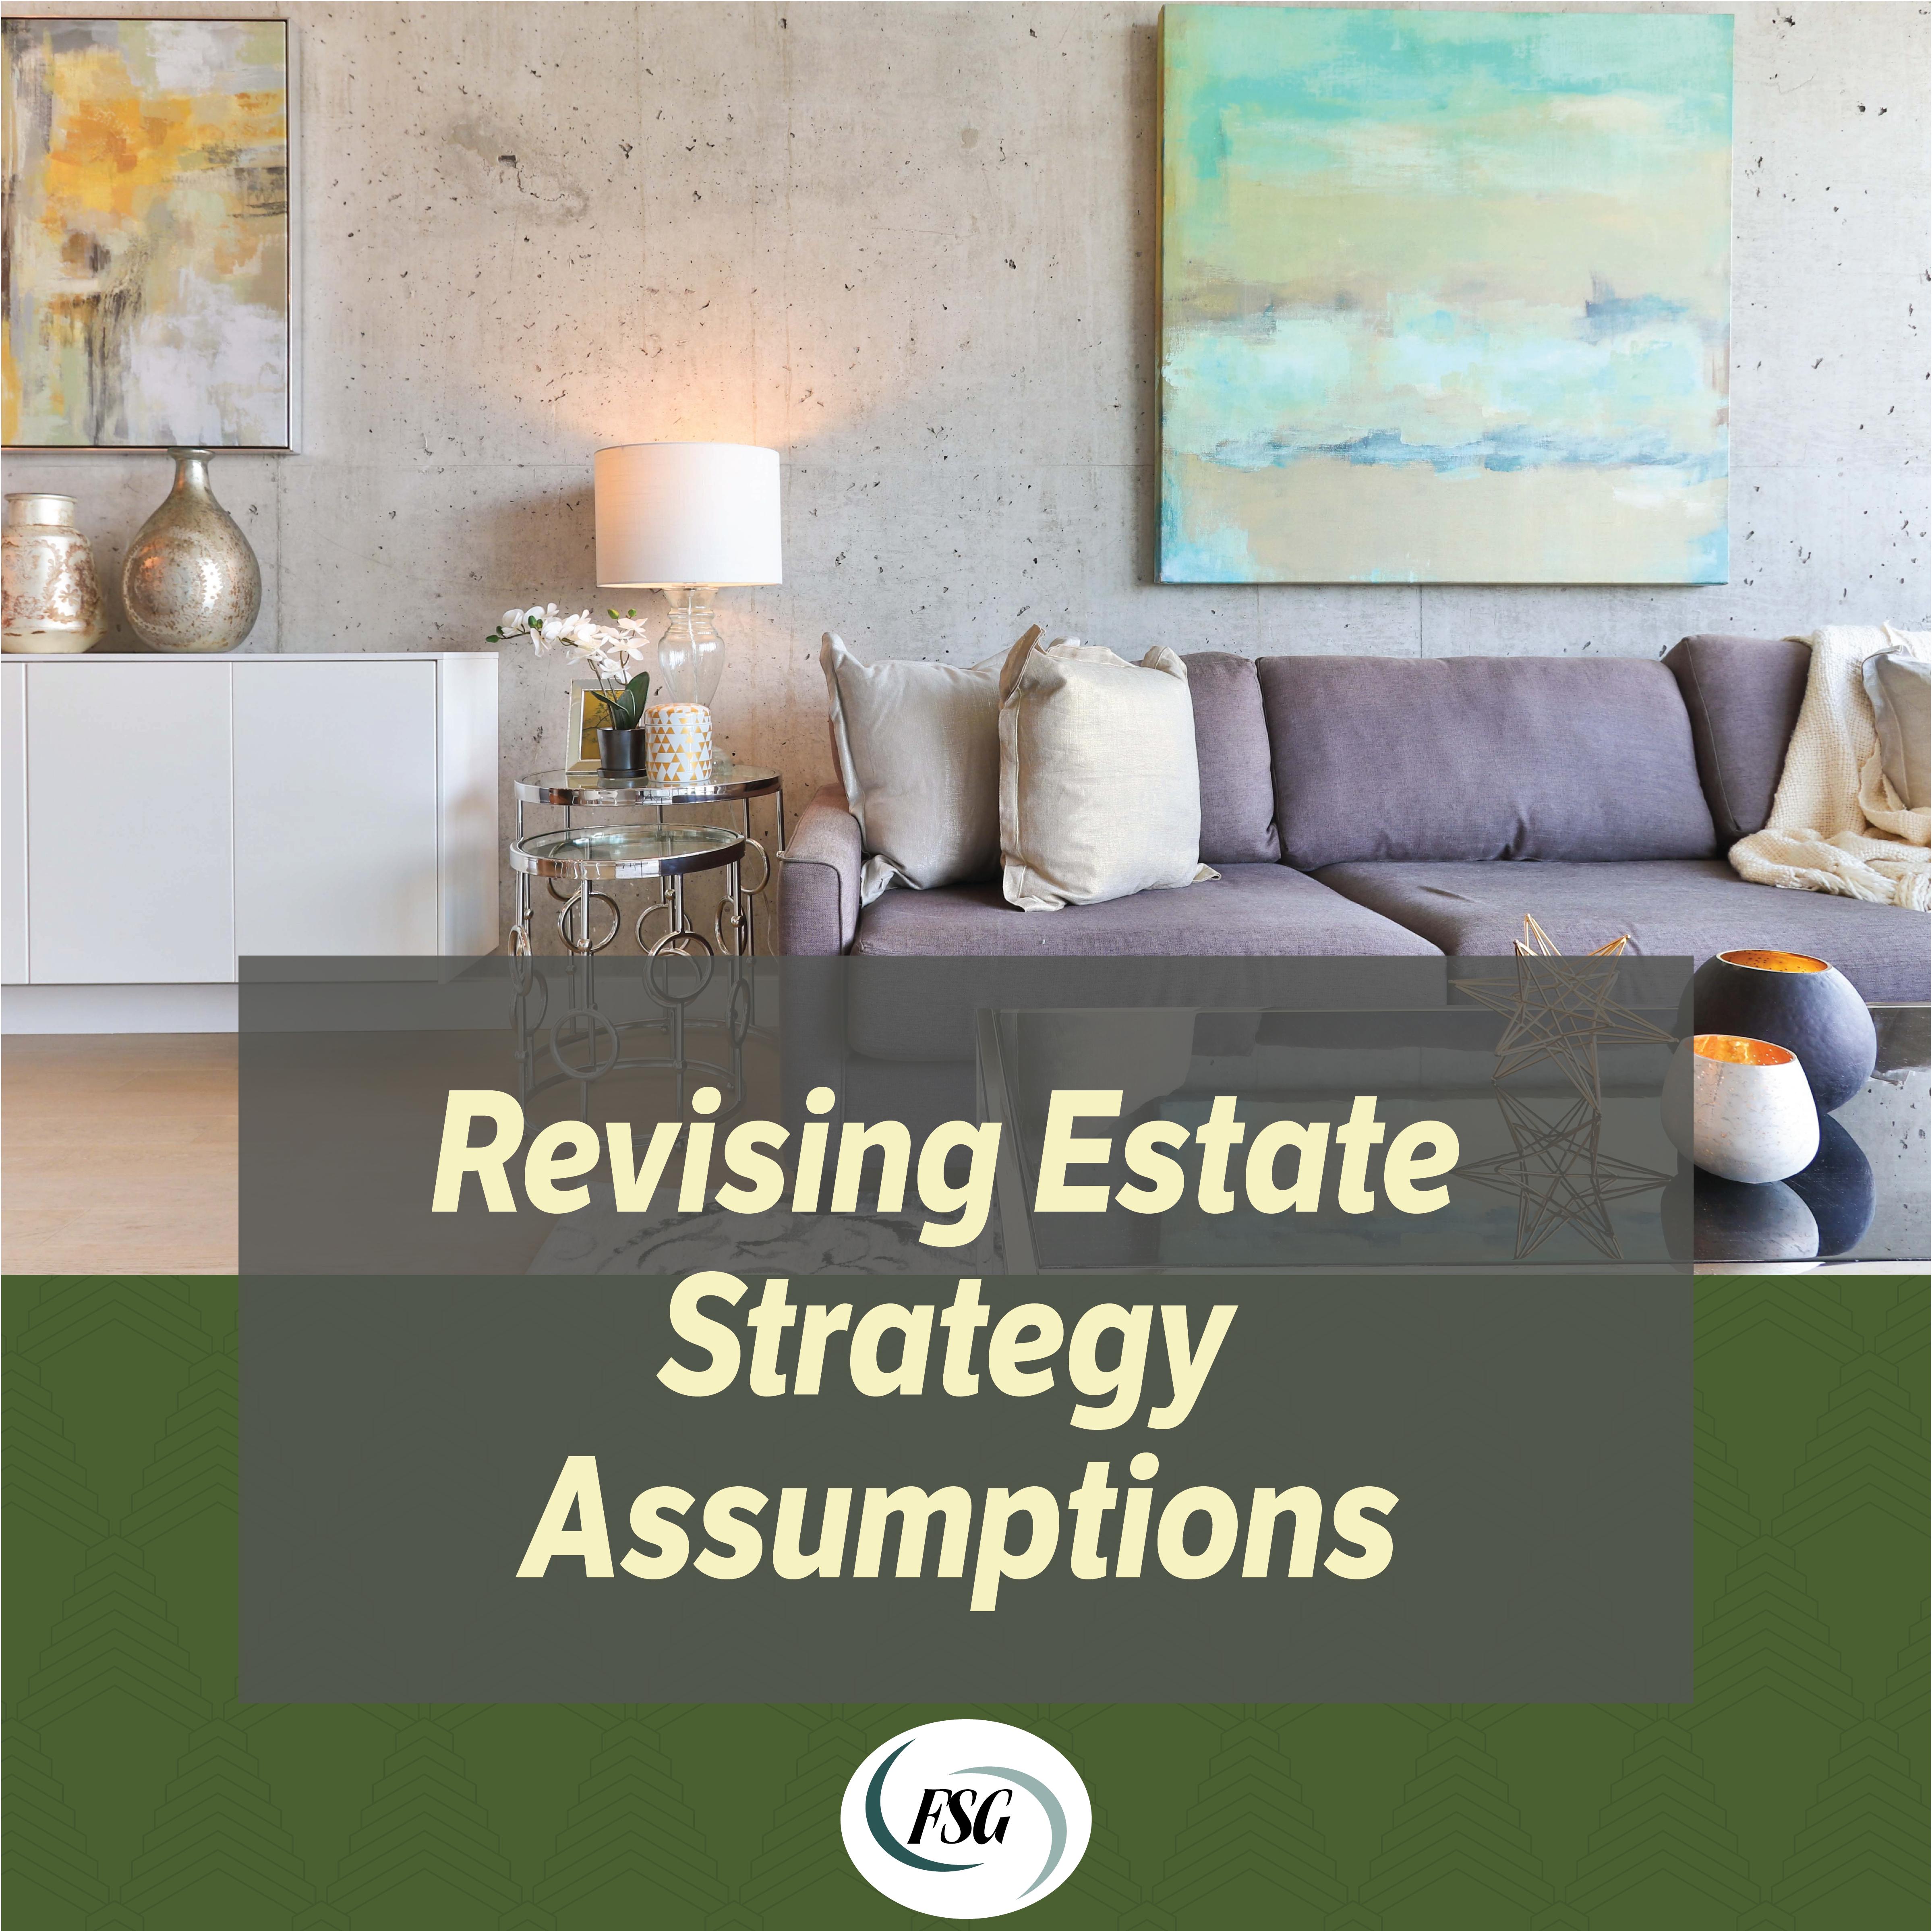 Revising Estate Strategy Assumptions